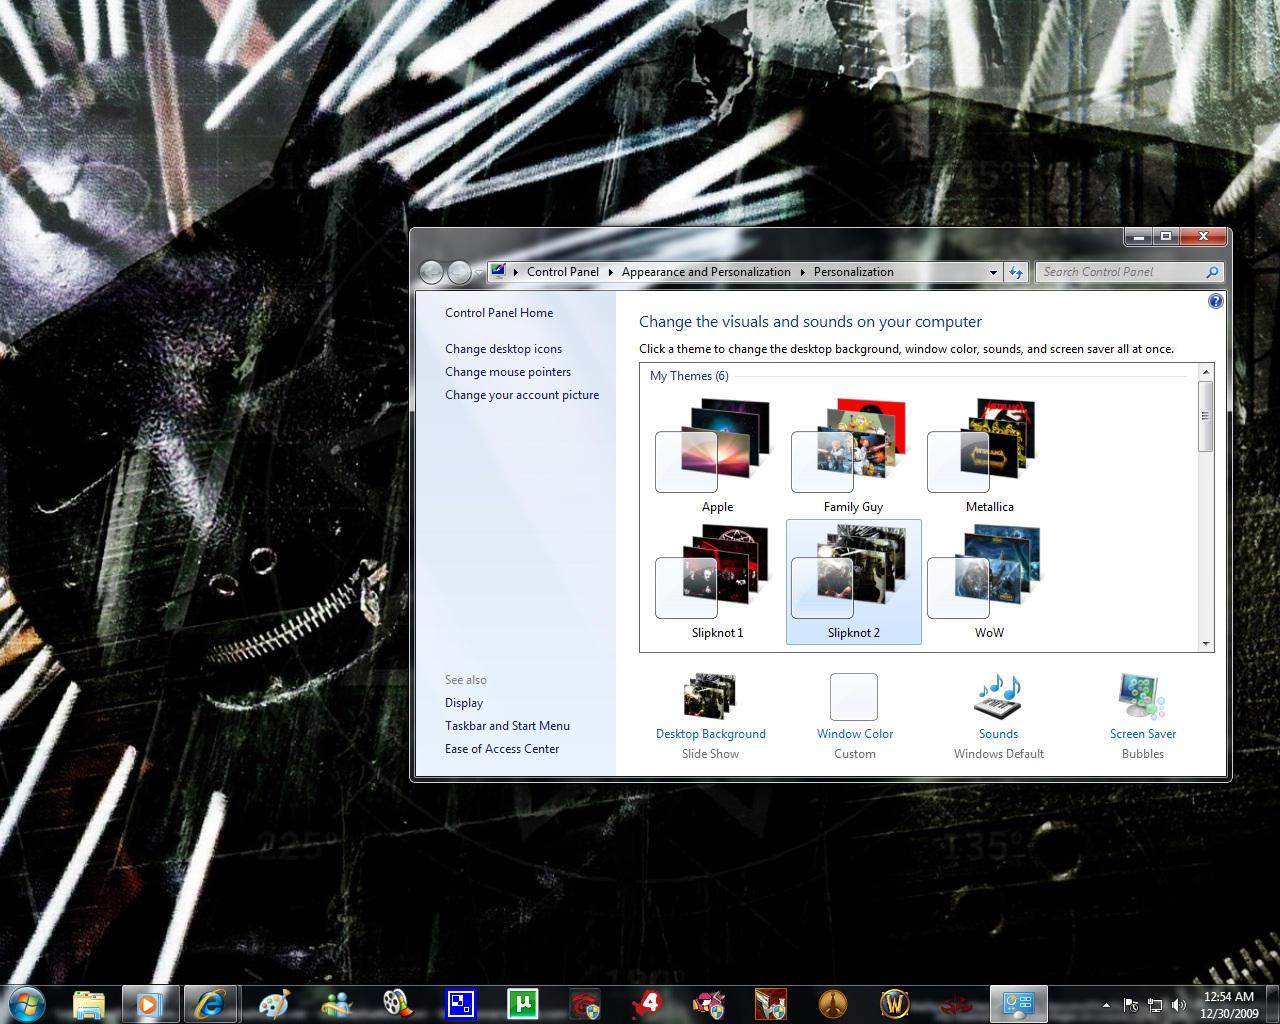 Windows 7 Themes: Slipknot 2 by pictionaryo